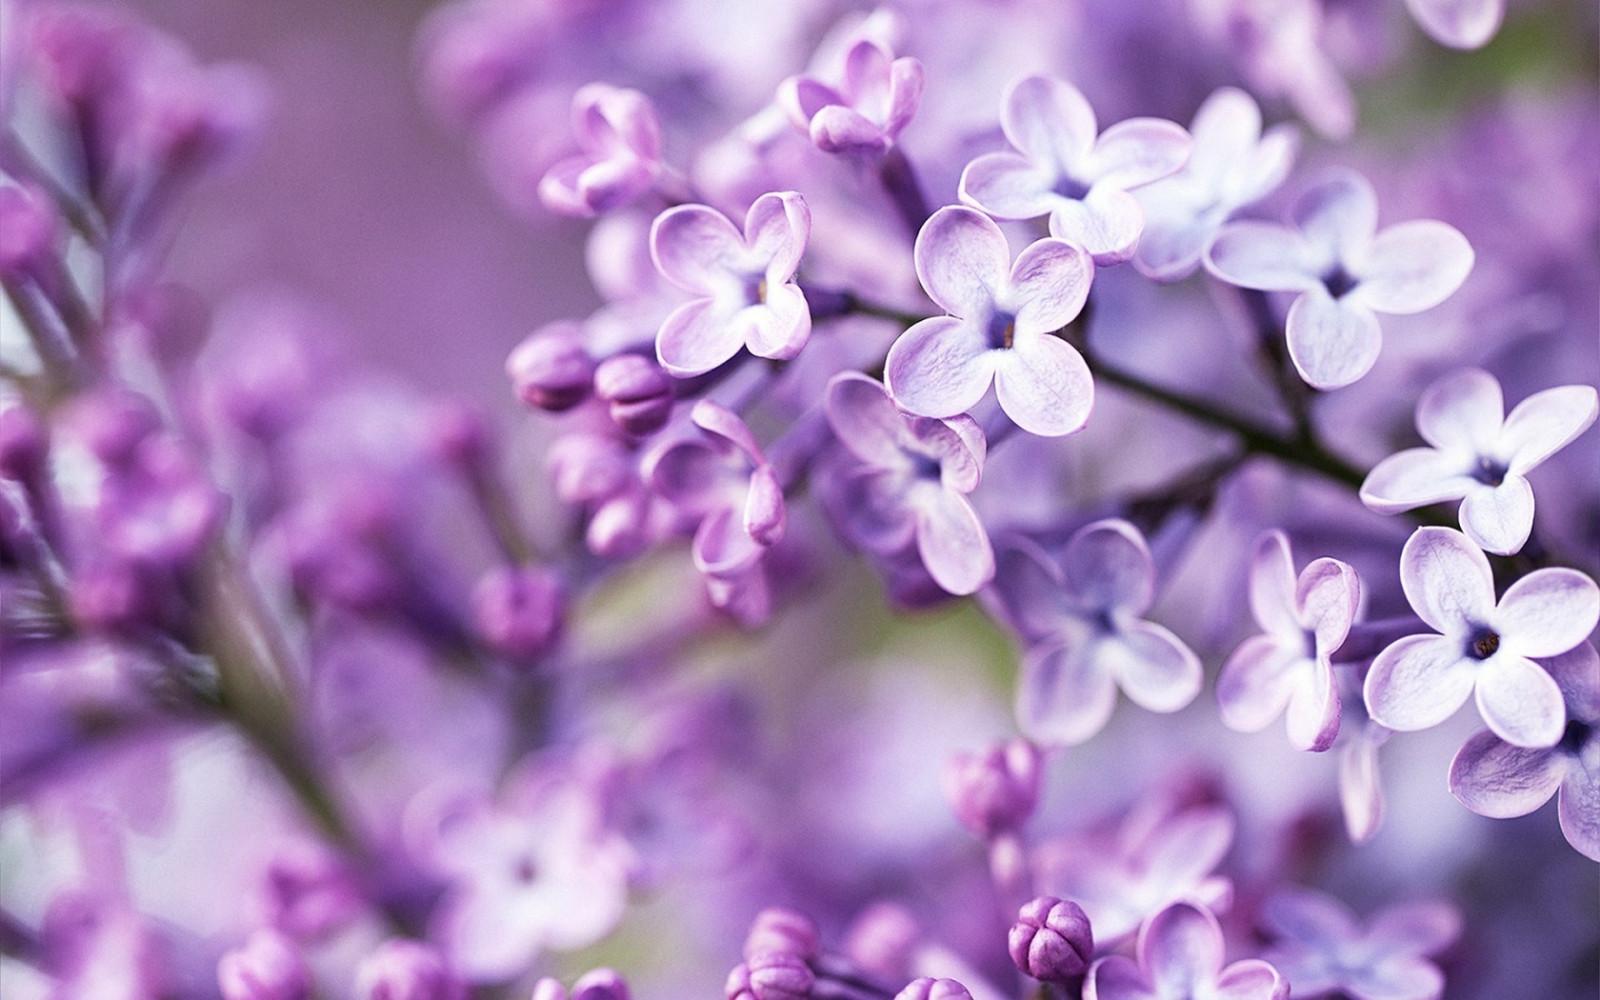 Fotos de flores para salvapantallas 89